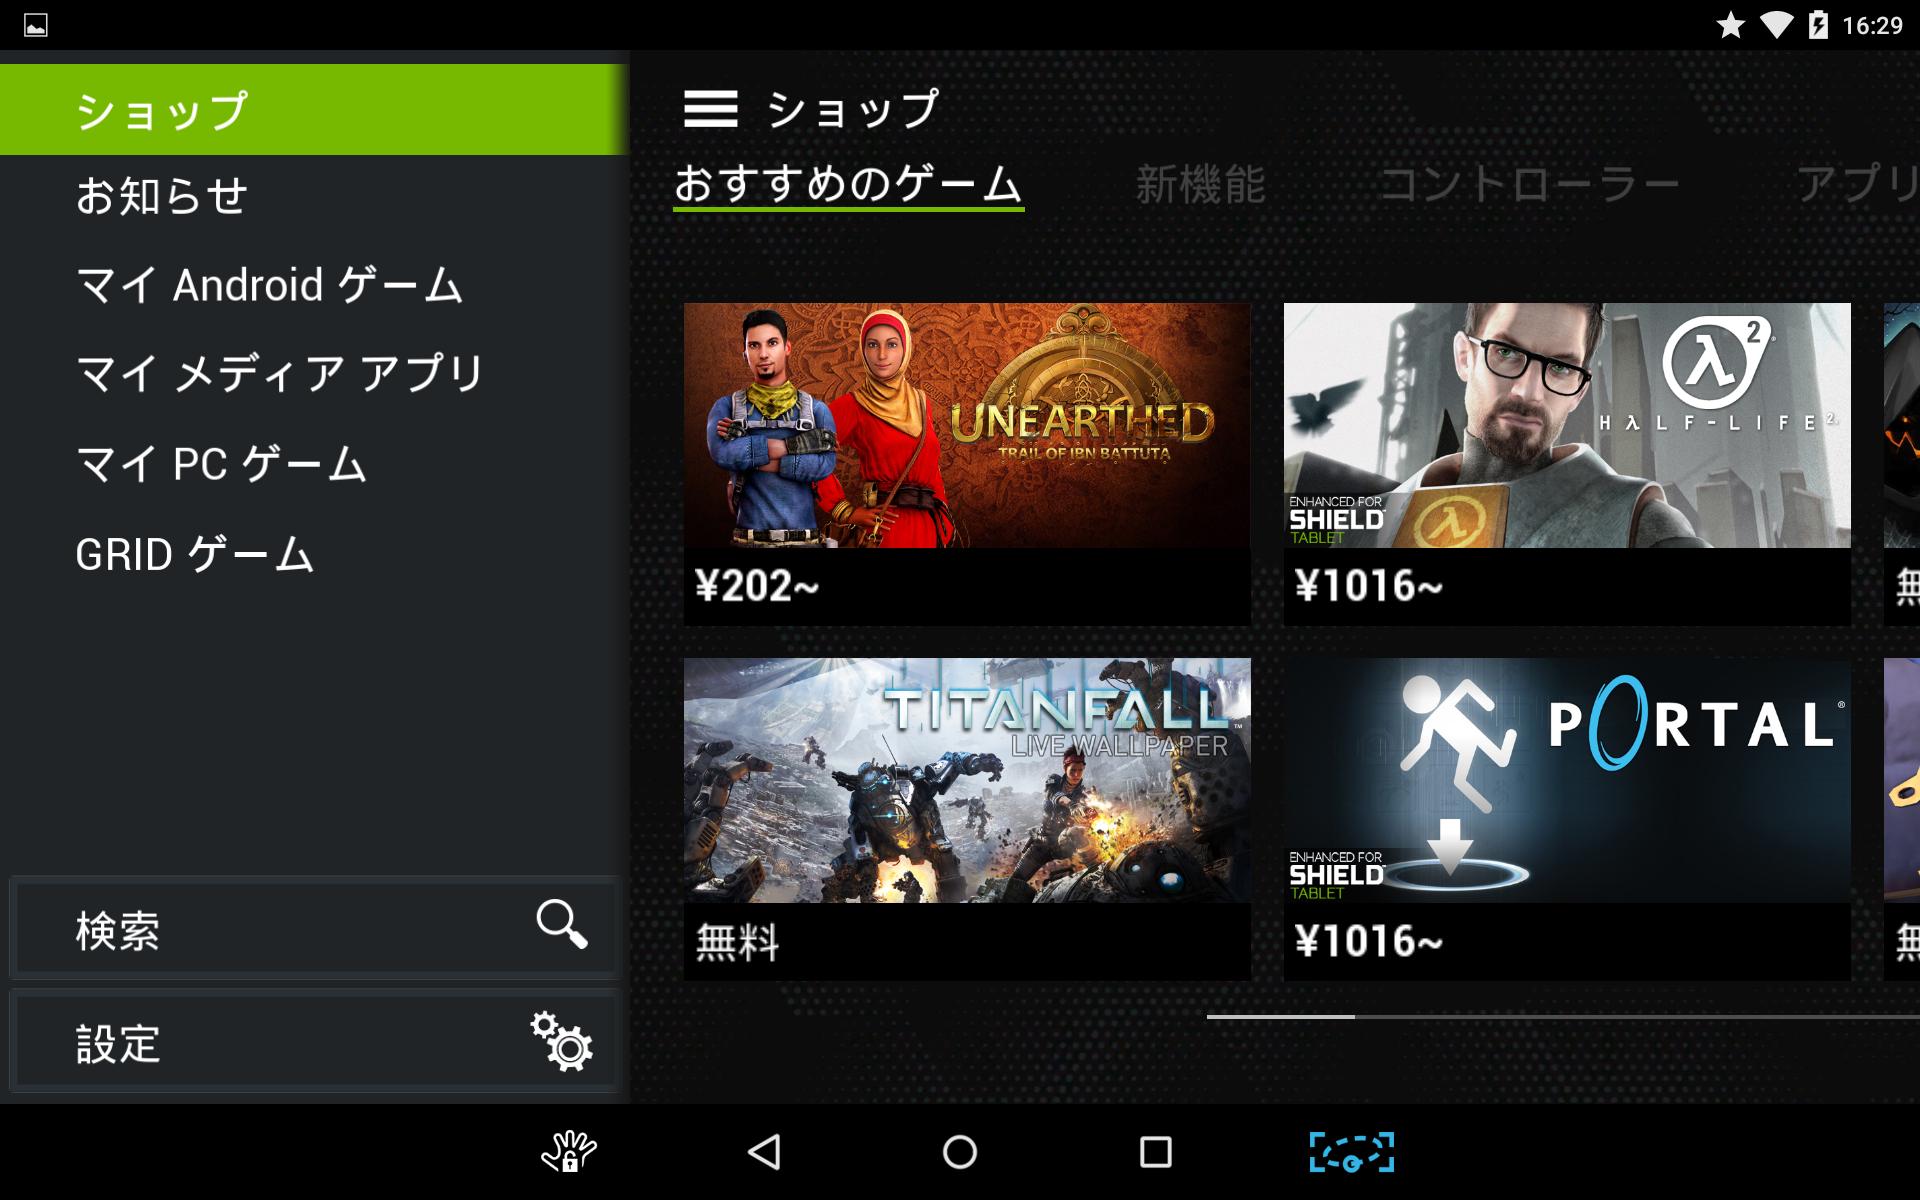 SHIELD HubにGRIDゲームが追加。ただし日本はまだ未対応。